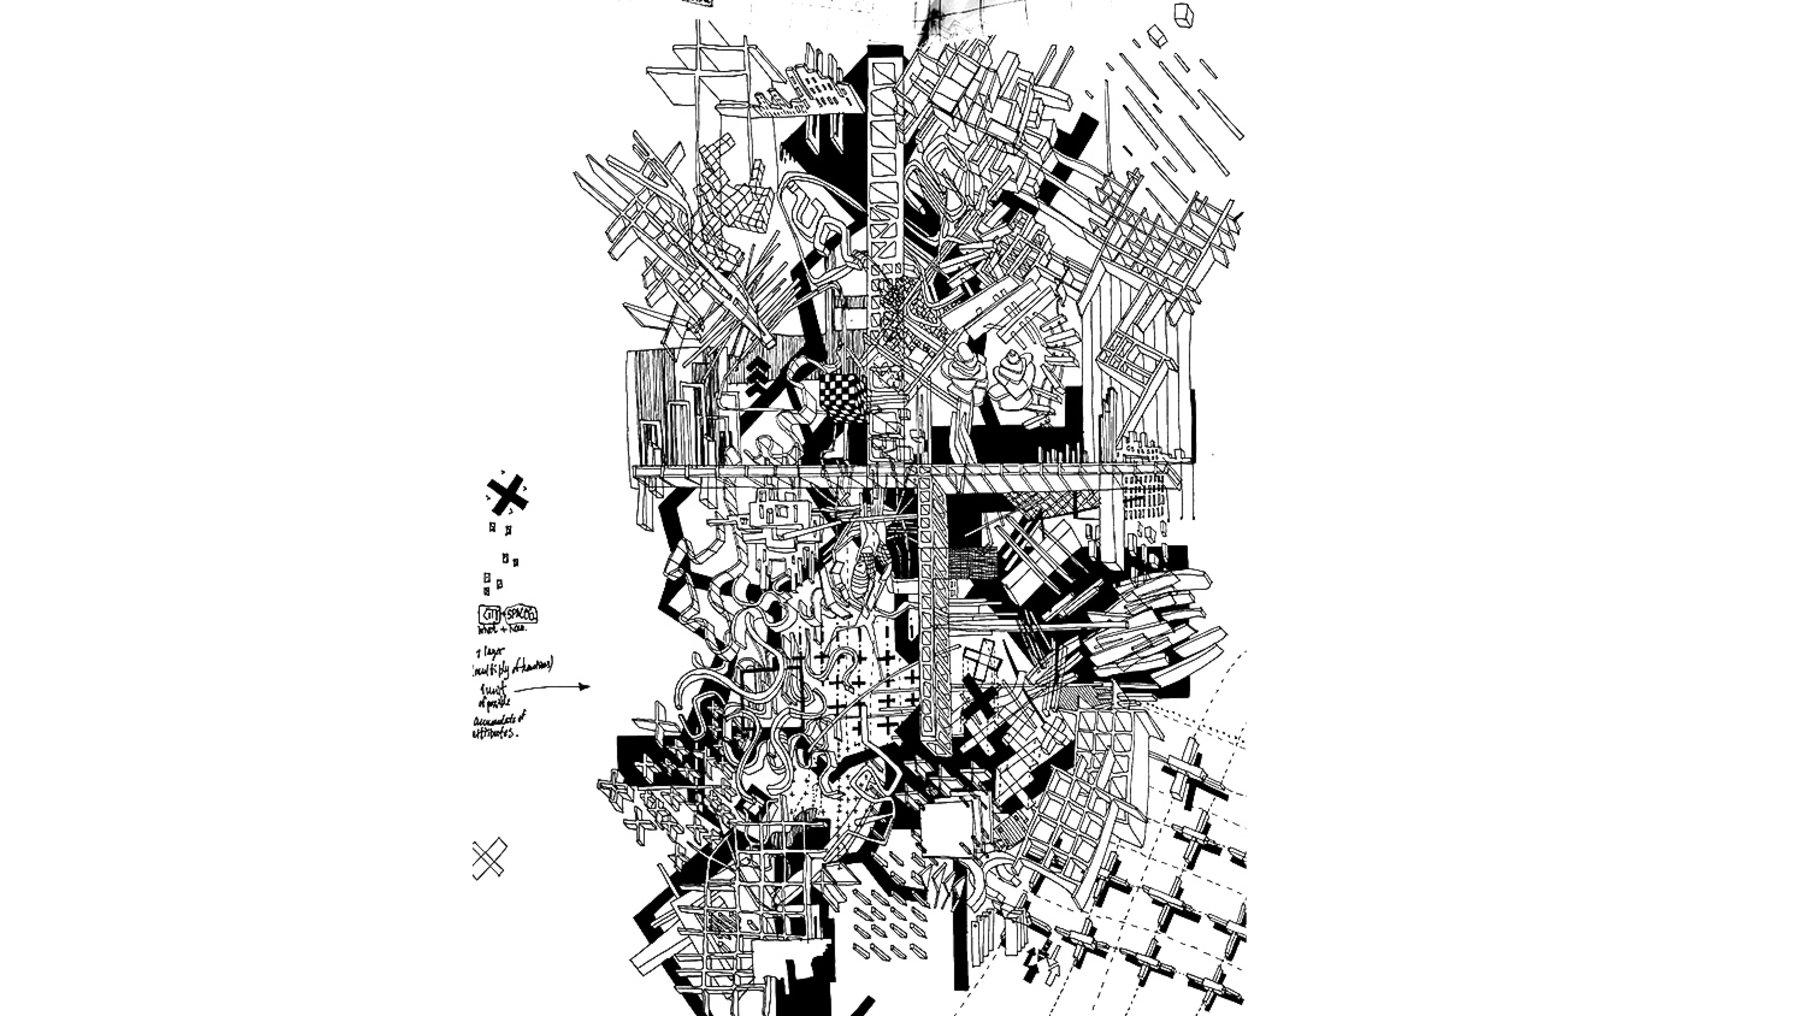 Masterthesis Ruslana Massarova - Remain Human. Planning Paradigms in Analog Second Nature.